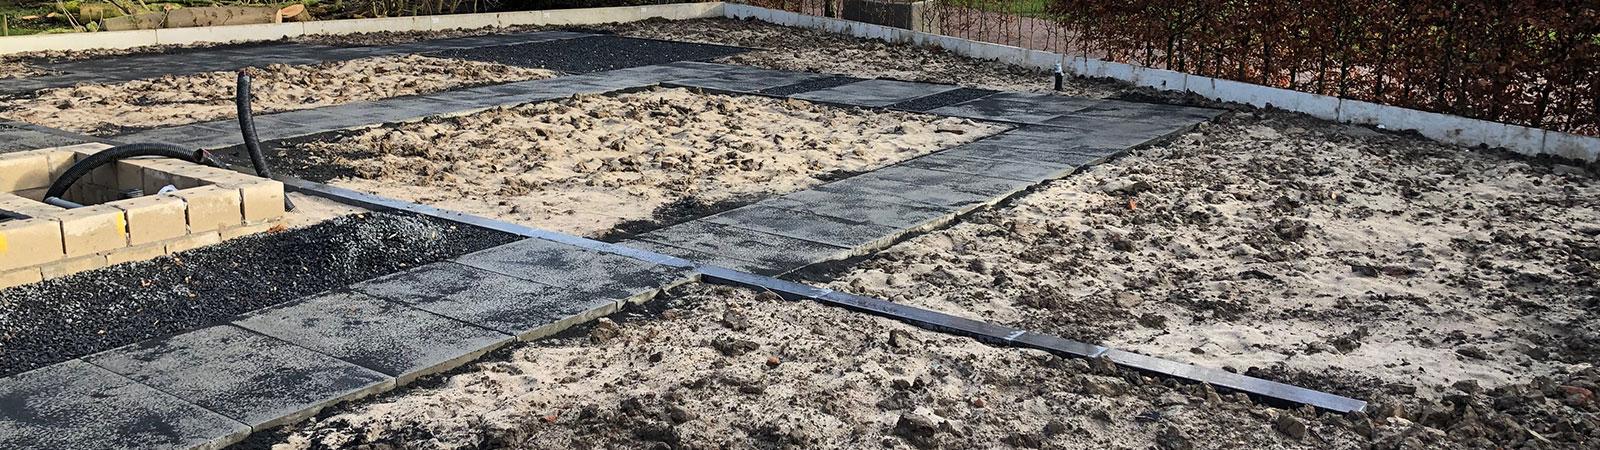 Bestrating - Aanleg tuinbestratingen Geldermalsen